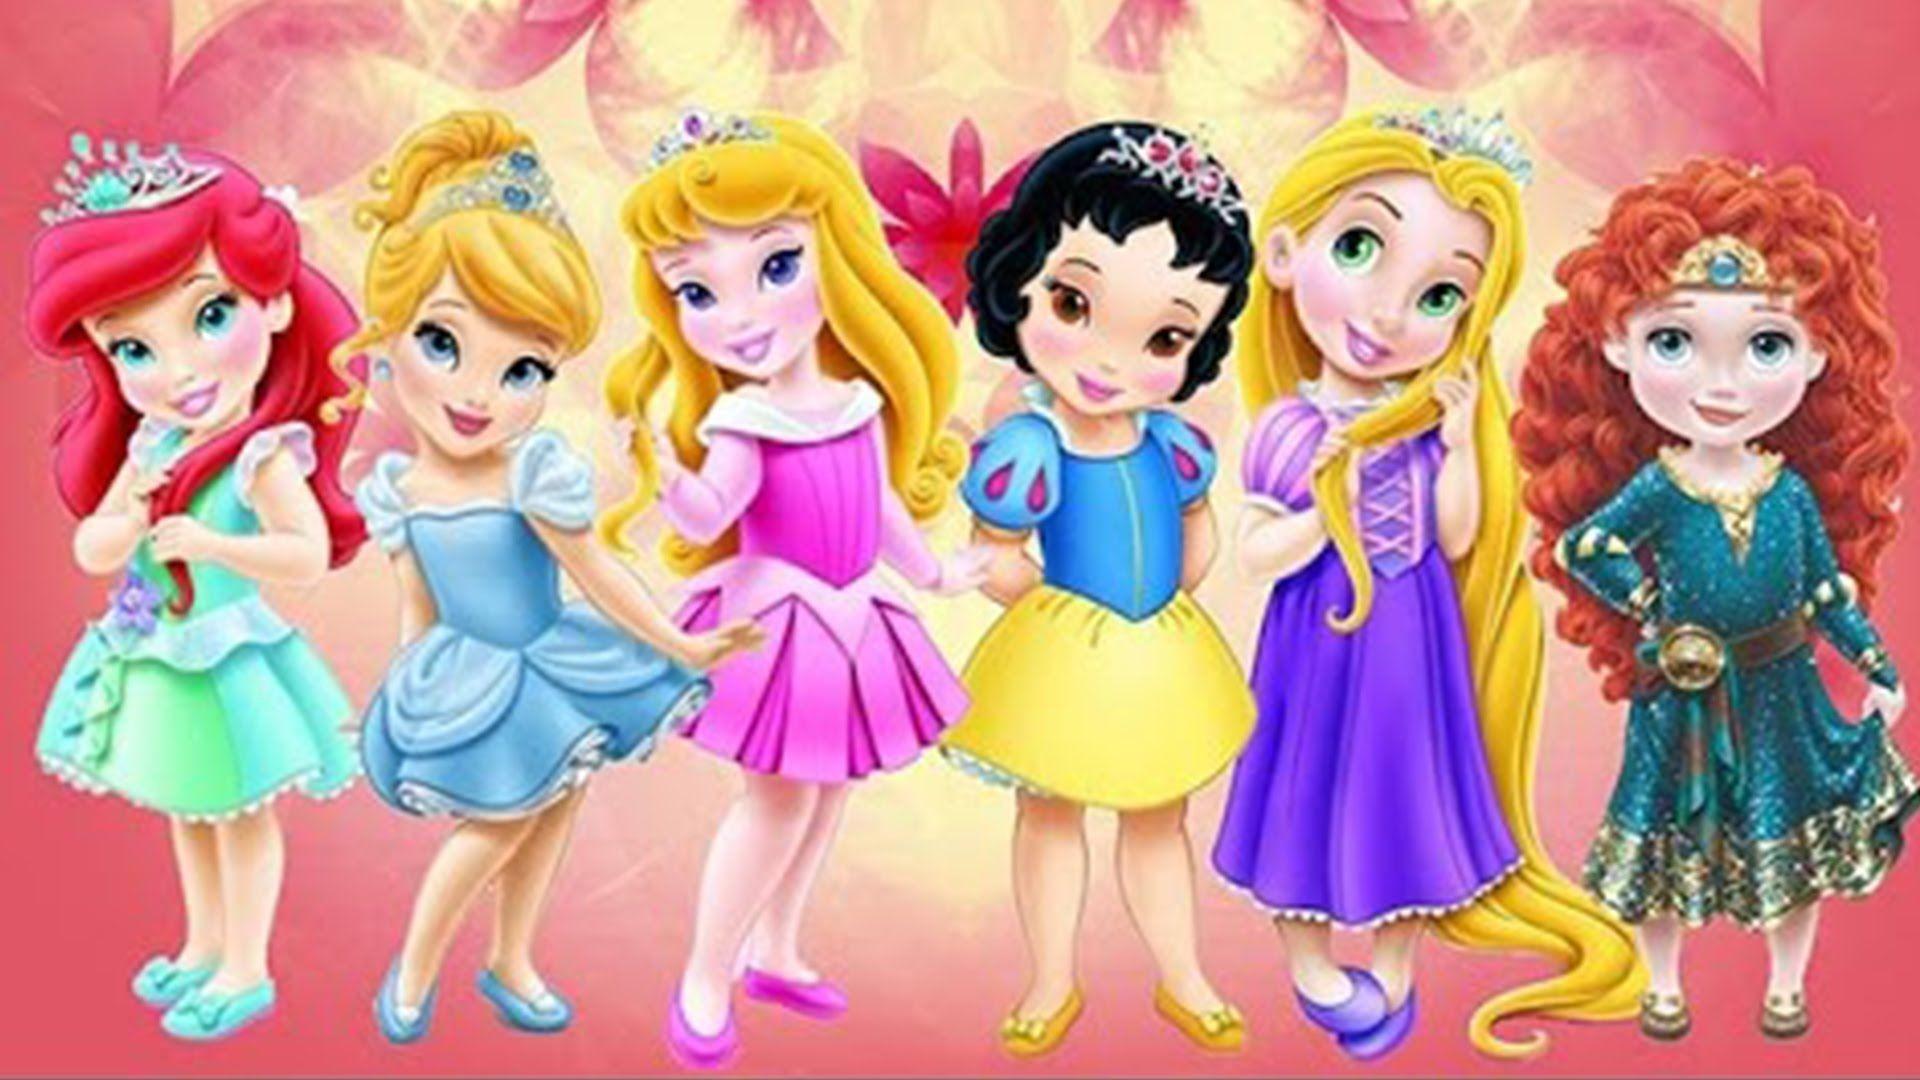 Download Princess Wallpaper Hd Backgrounds Download Itlcat